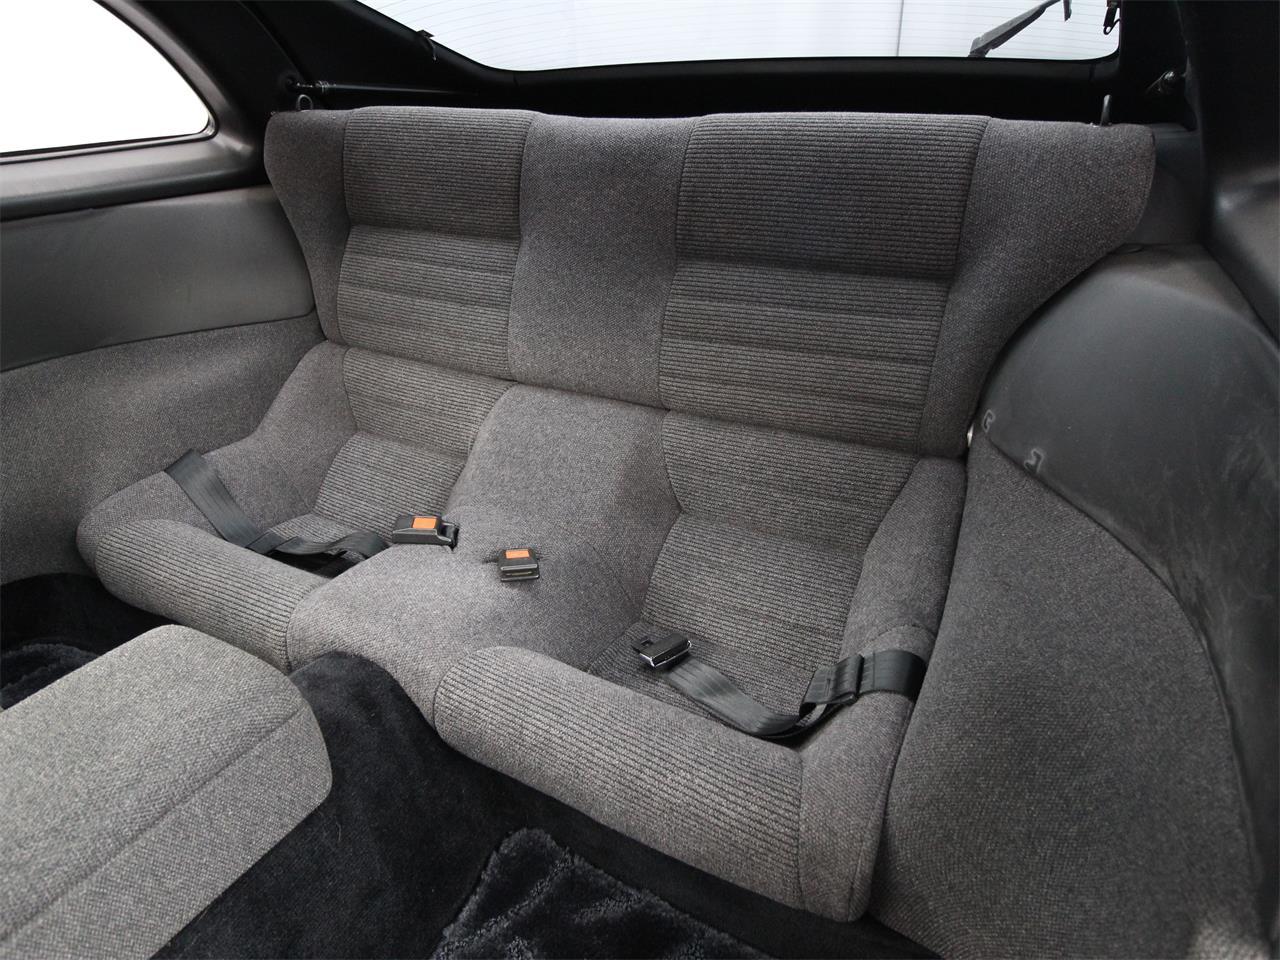 1989 Nissan Fairlady (CC-1276321) for sale in Christiansburg, Virginia